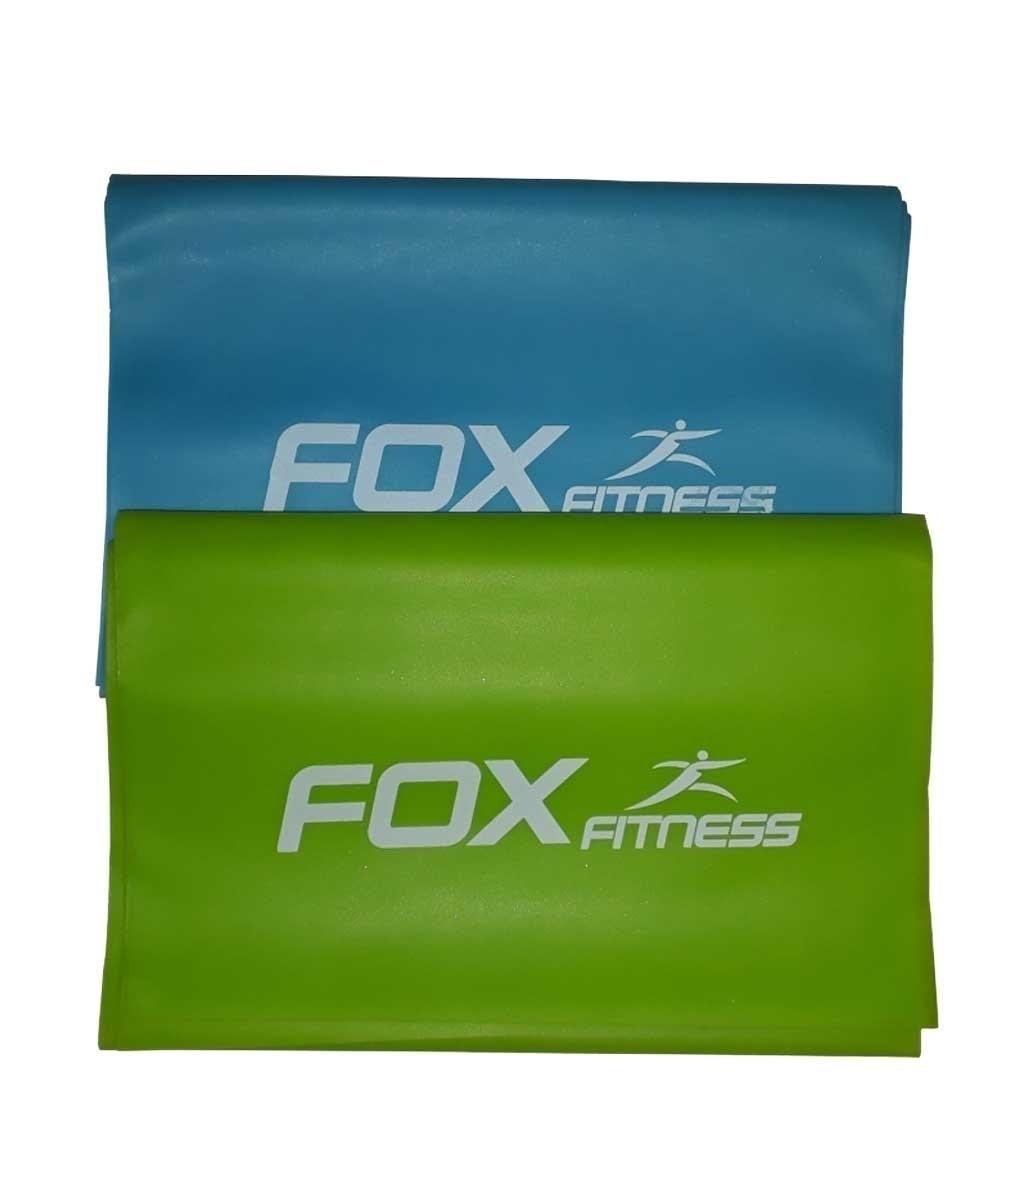 Fox Fitness Pilates/Yoga Direnç Lastiği Seti